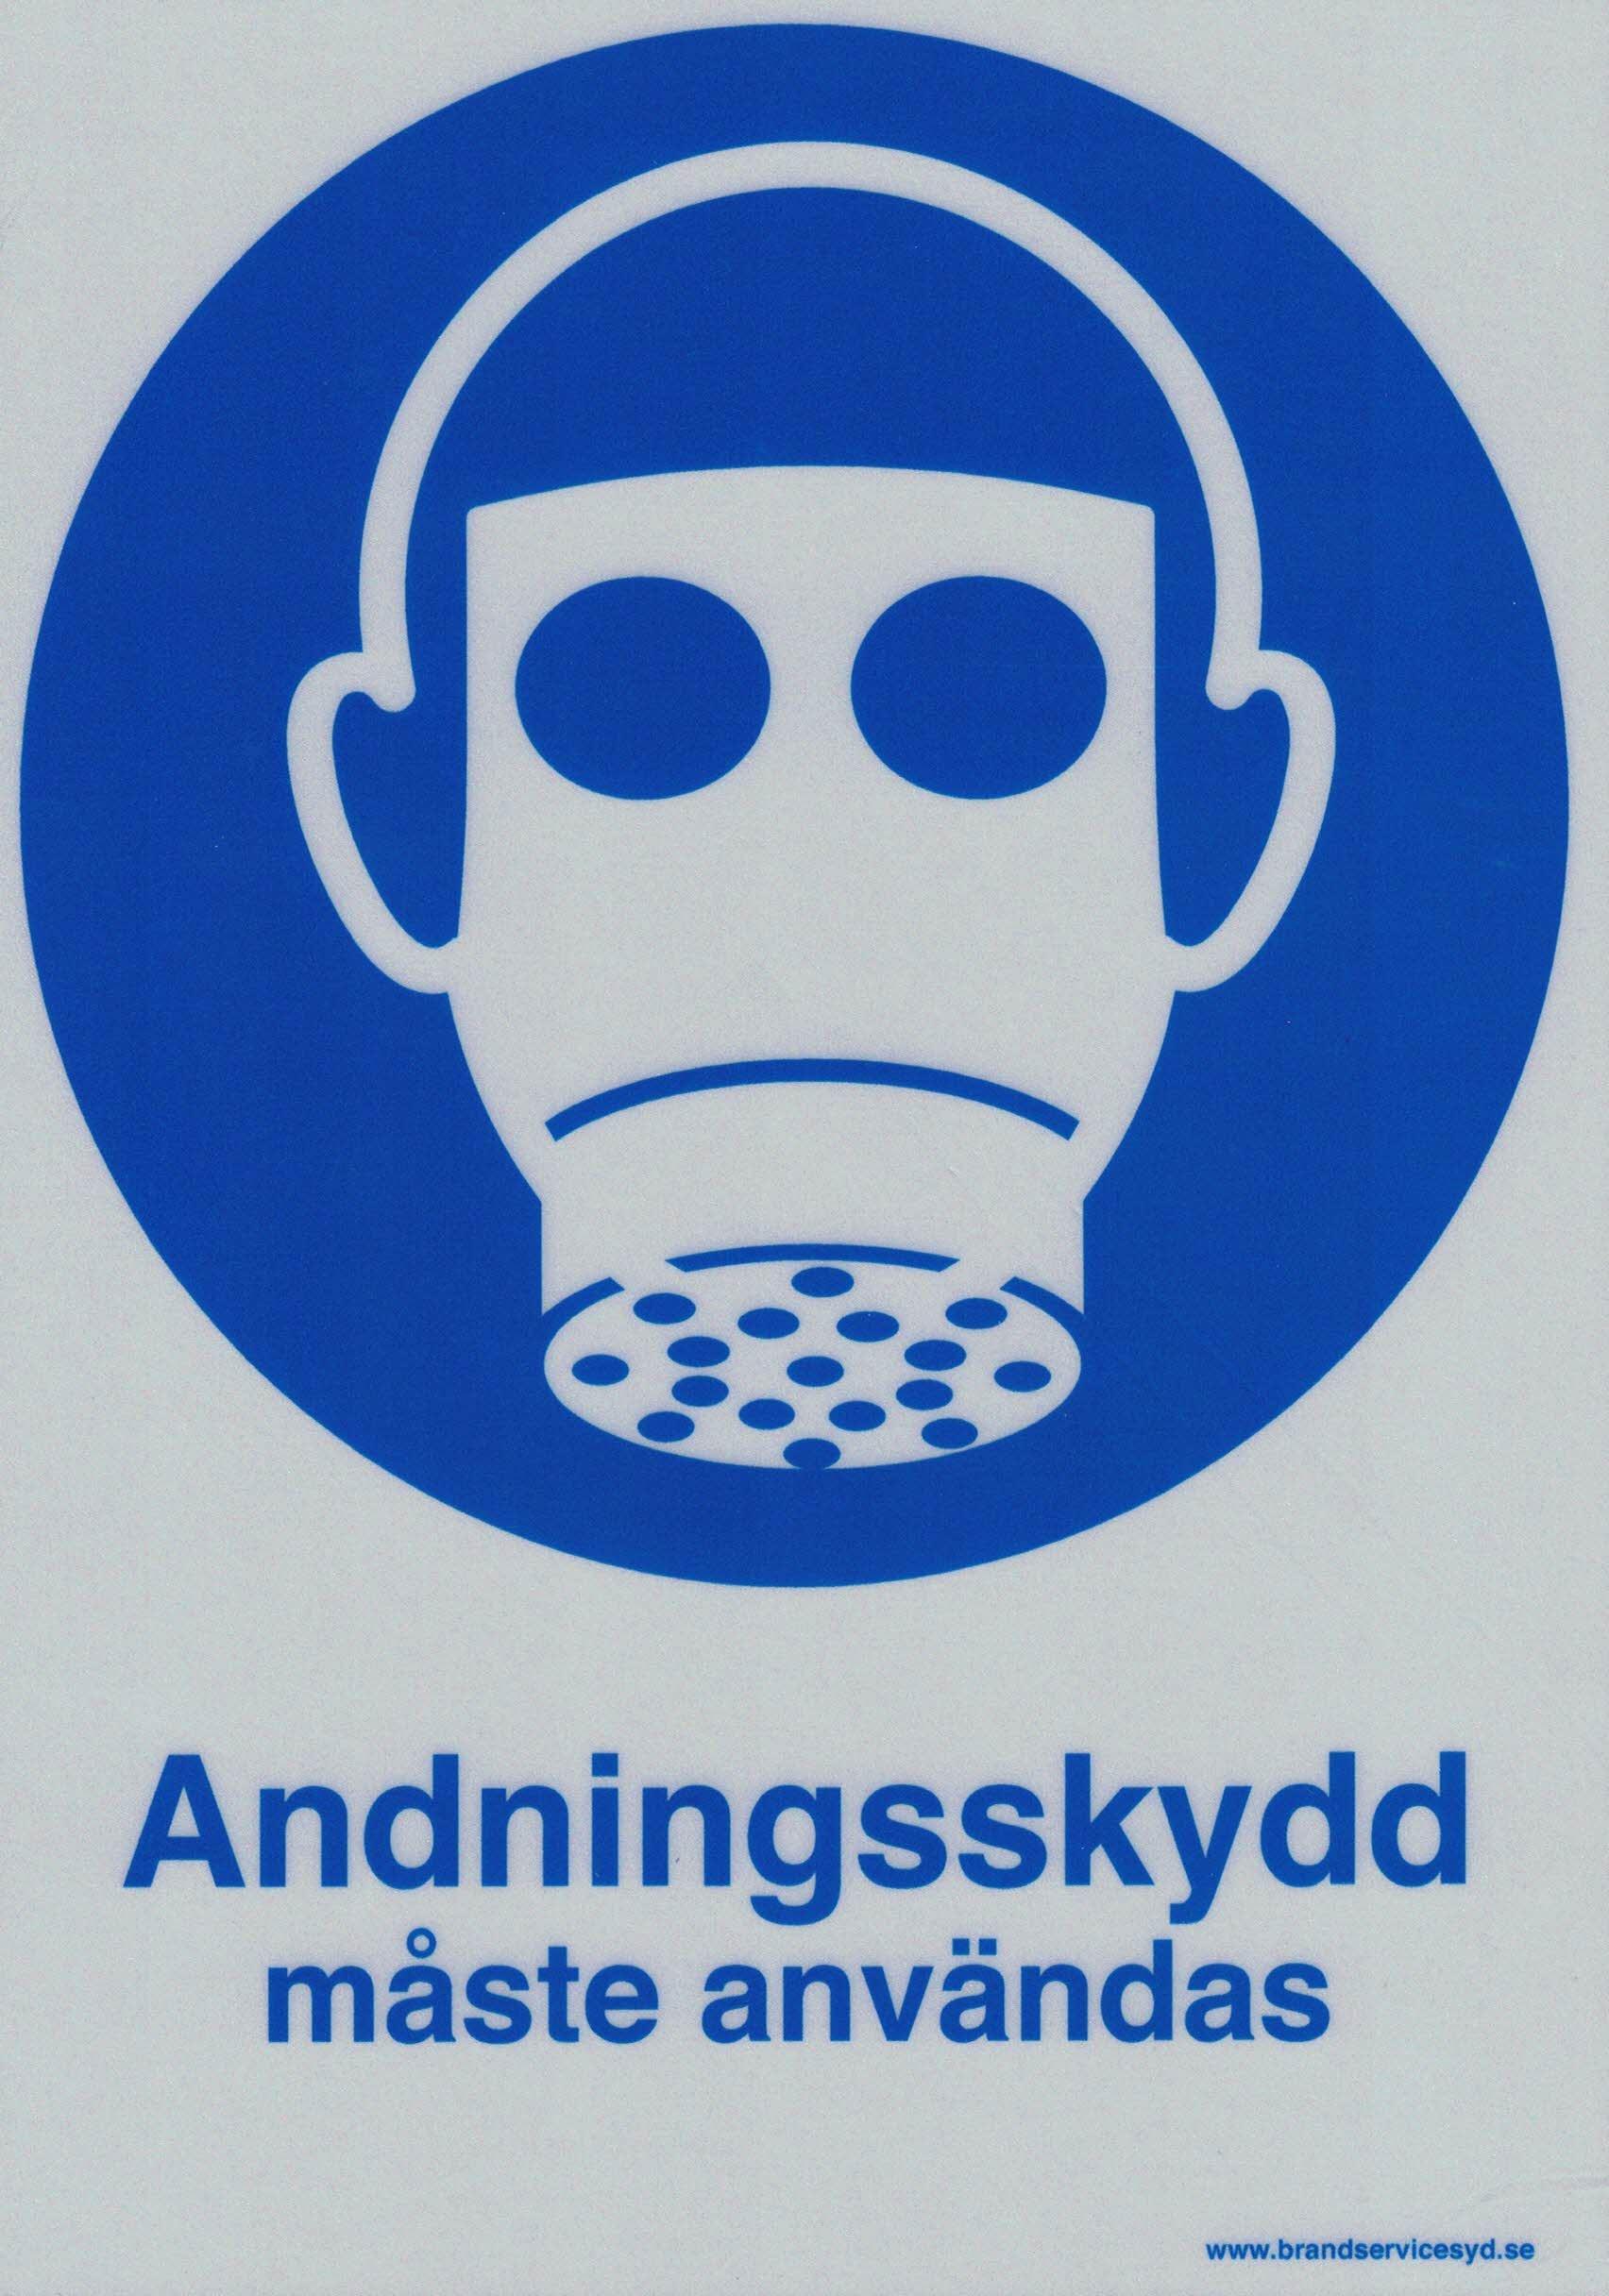 Andningsskydd  A5  20180820